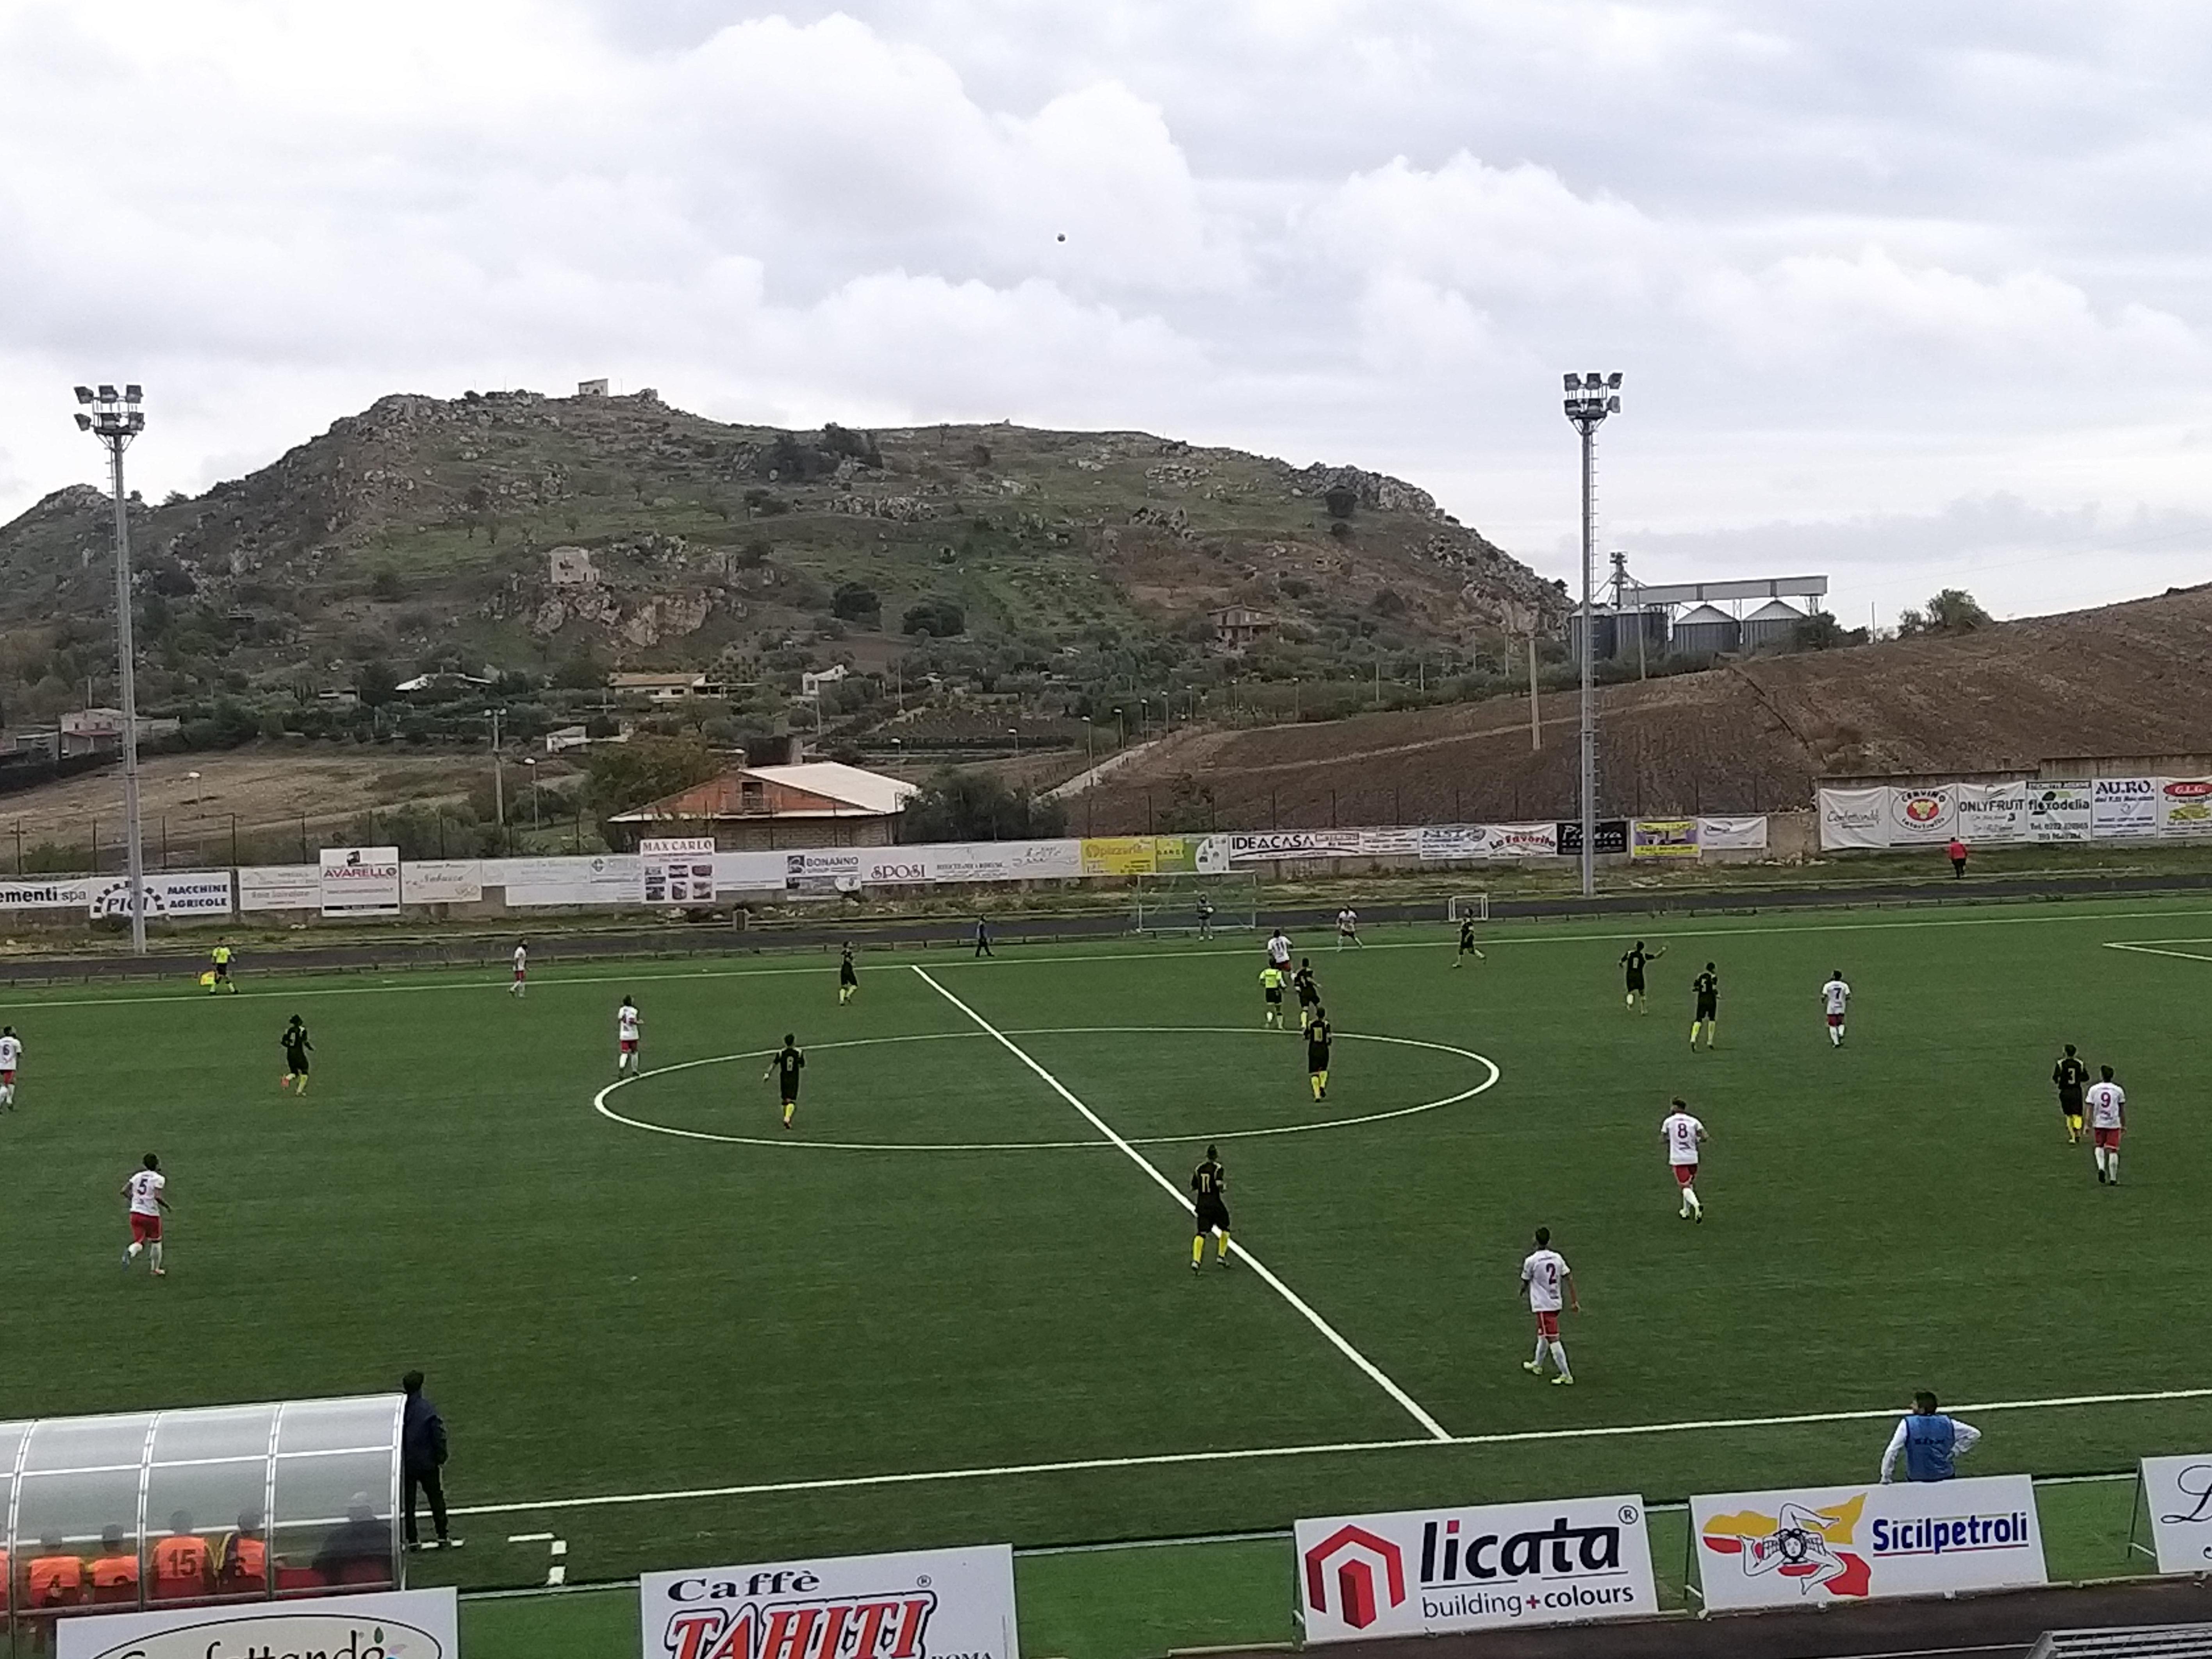 Il Mazara domina la gara, sfiora in diverse occasioni il gol ma cade a 5'dal termine per una prodezza di Caronia. Canicattì - Mazara 1-0